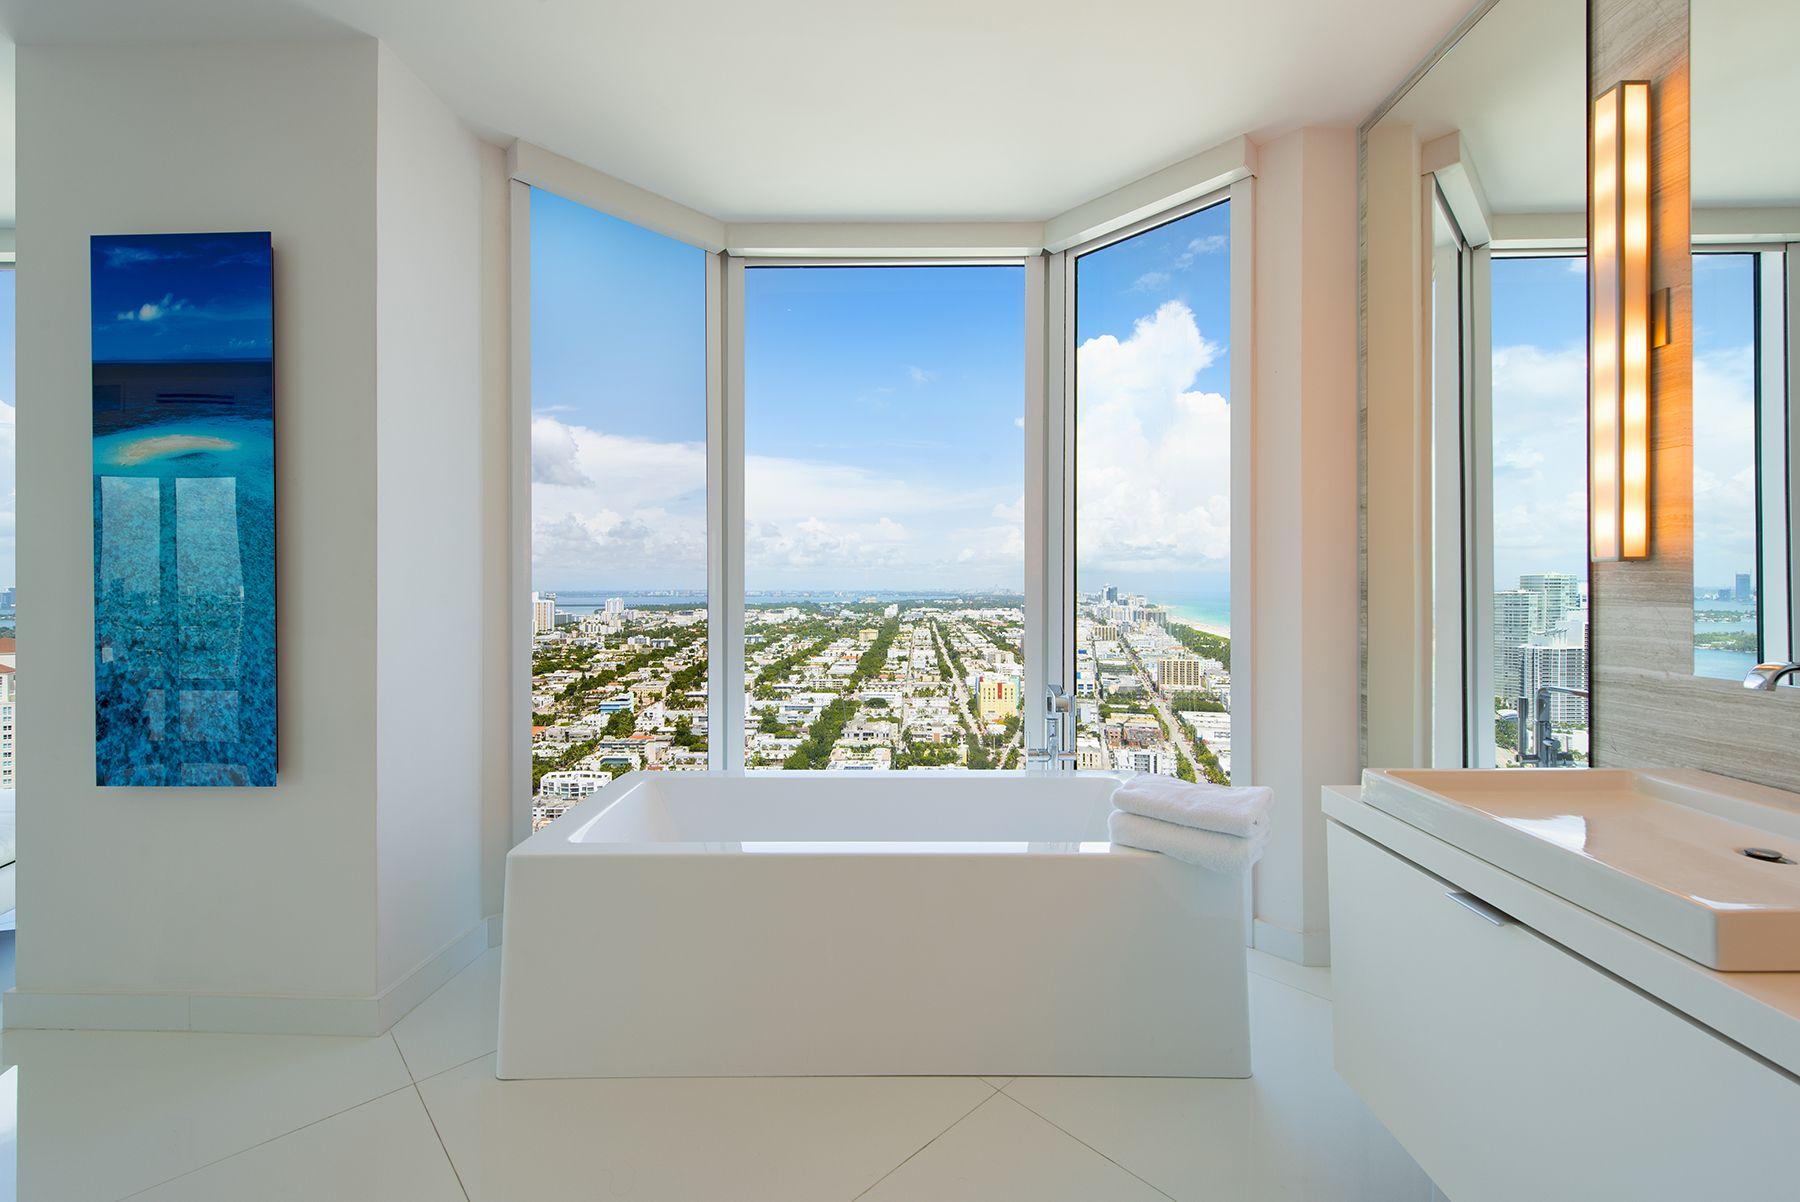 Portofino_Tower_Penthouse-16.0.jpg